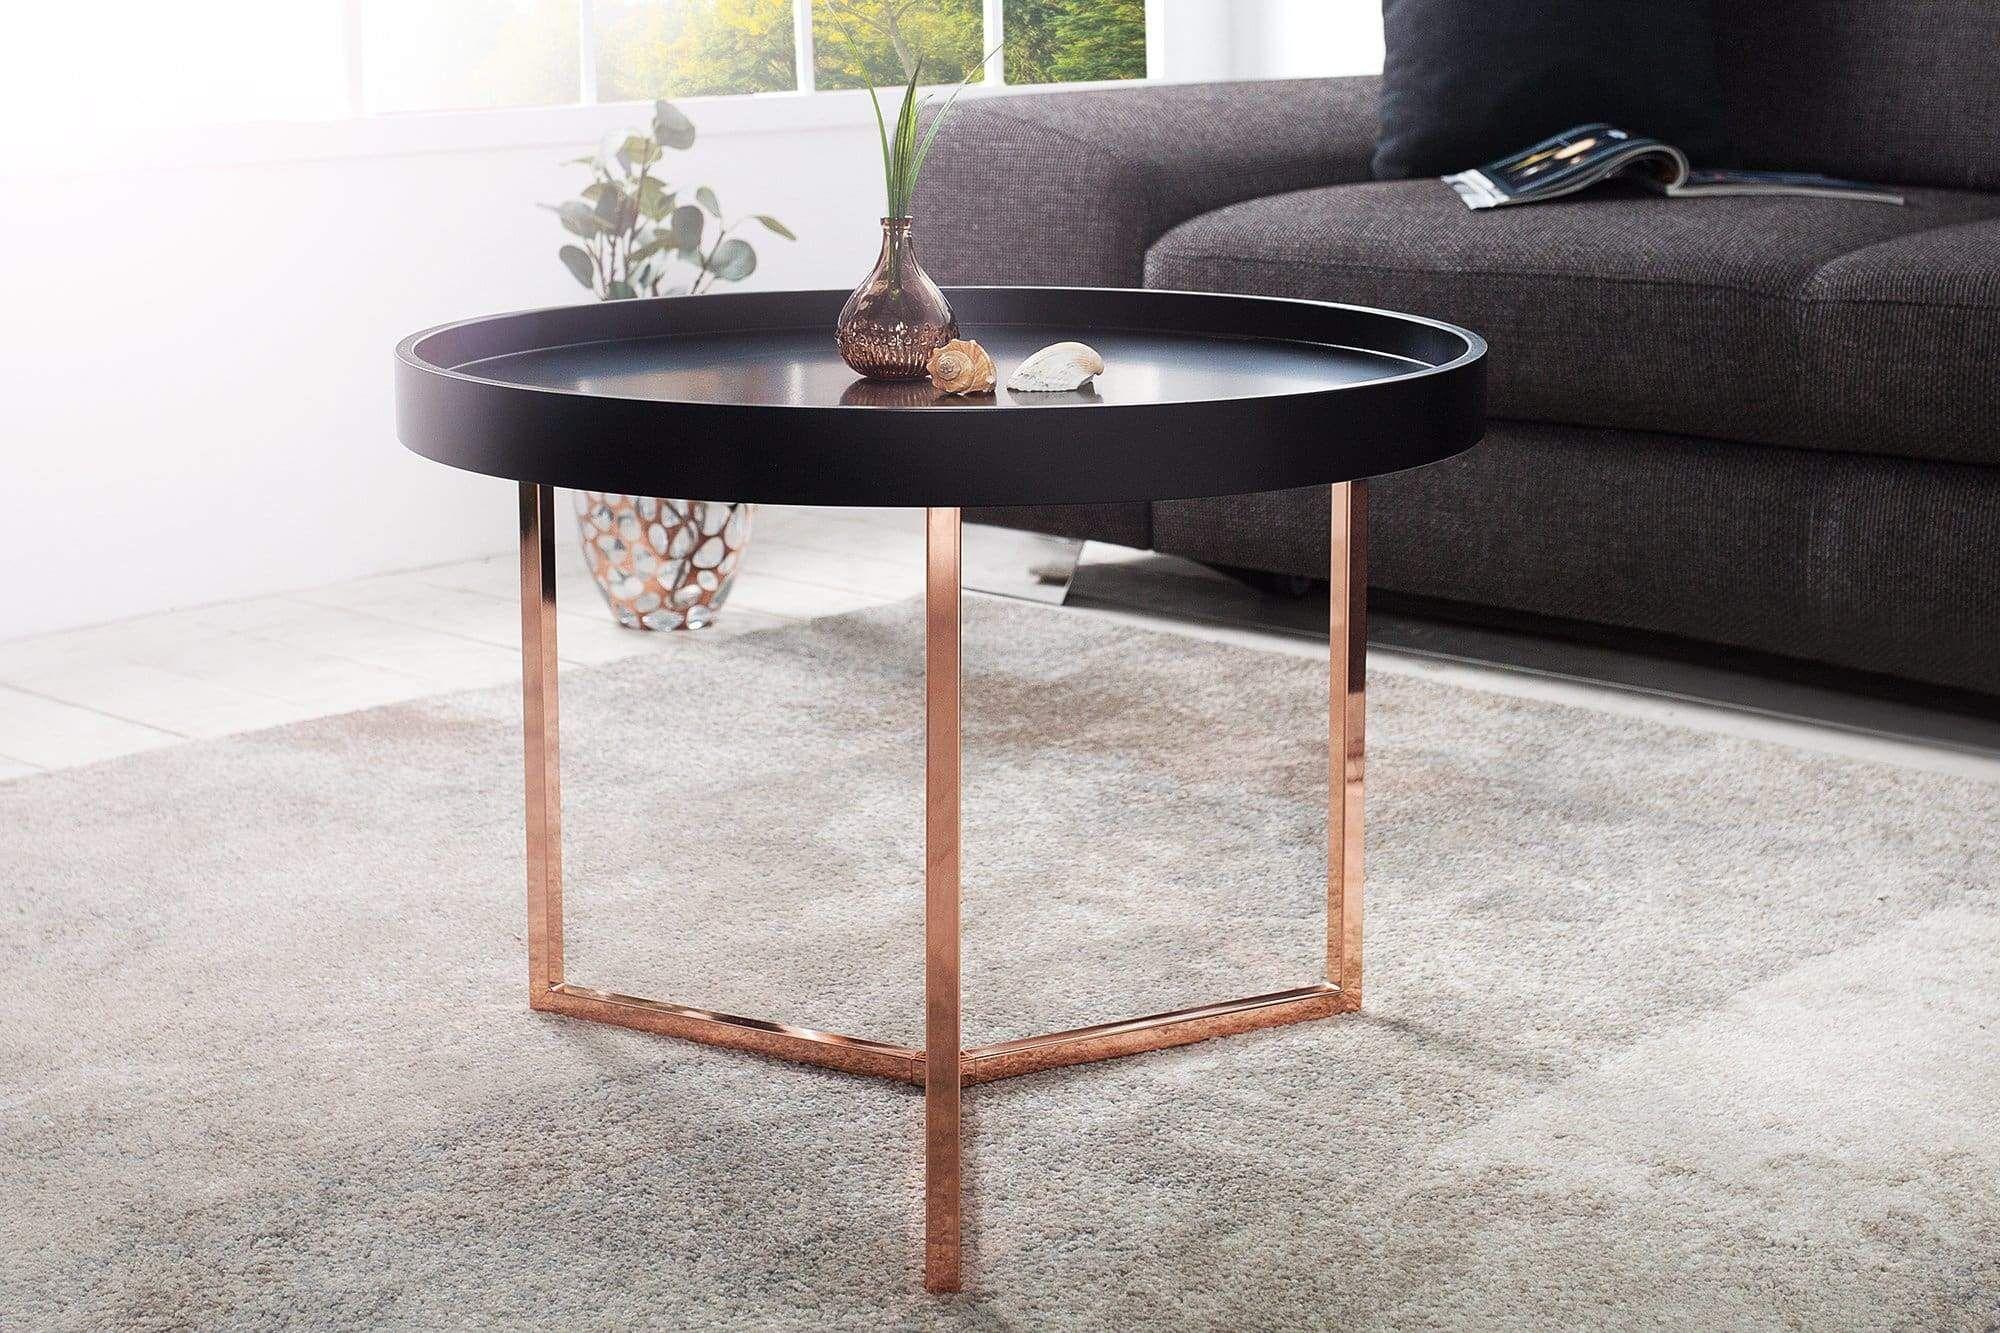 Modul Fekete Rez Dohanyzoasztal 60cm Lakberendezes Otthon Otthondekor Homedecor Furnishings Design Ideas Furnishingi Coffee Table Coffe Table Furniture